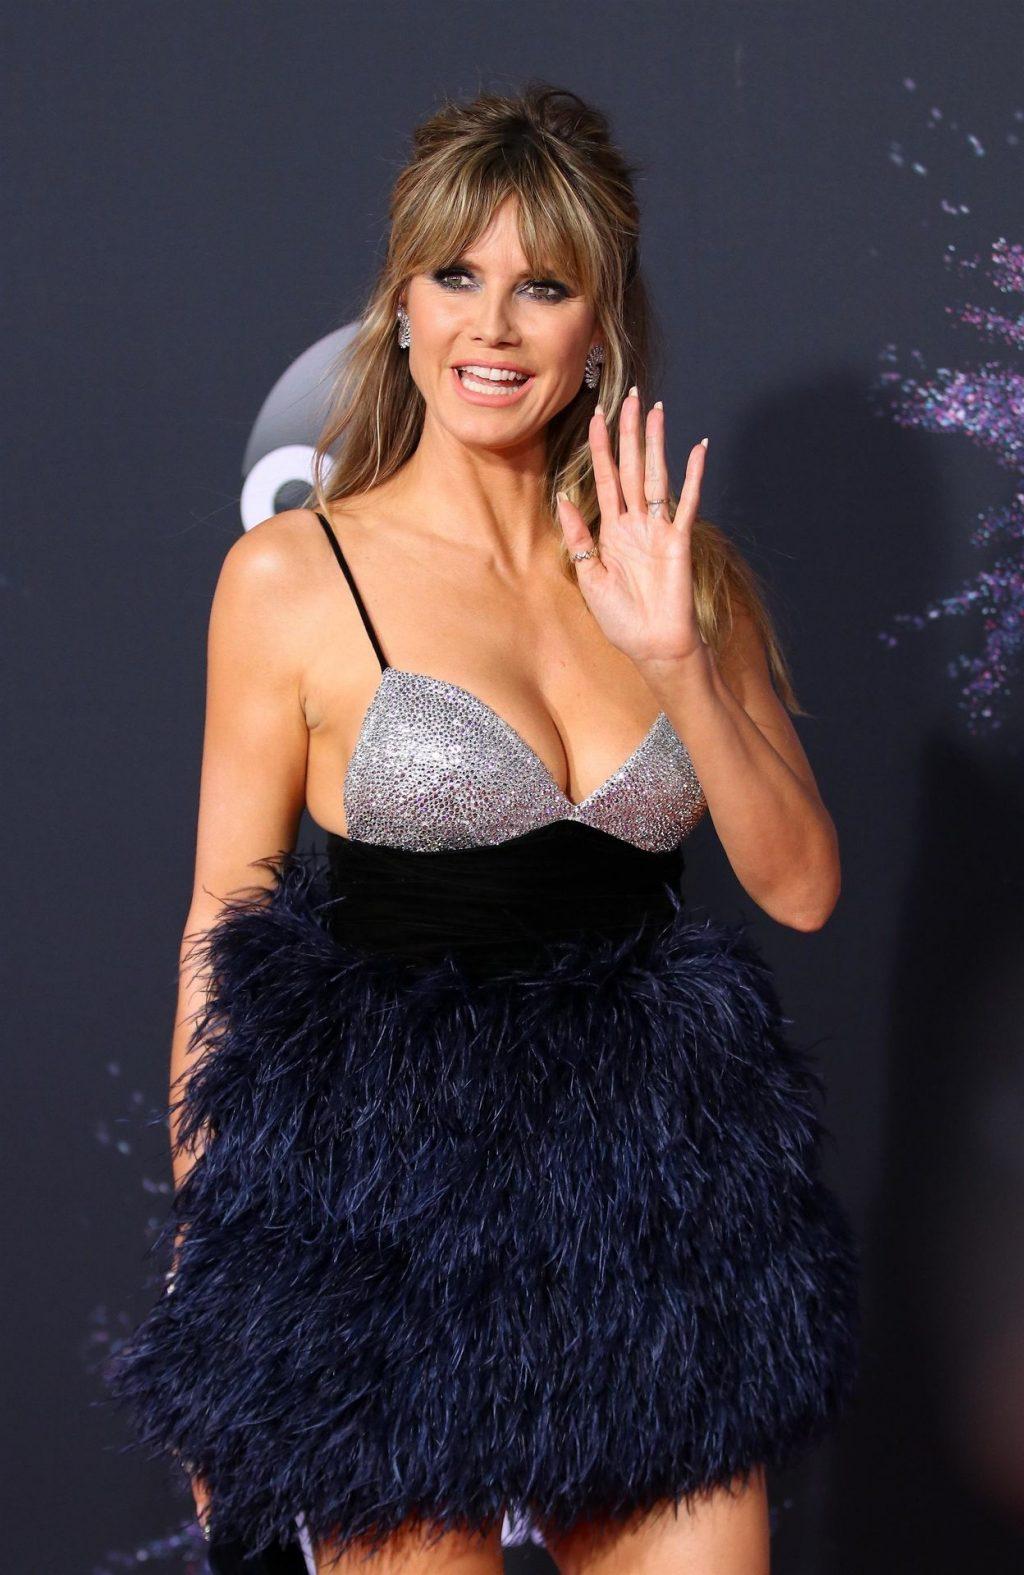 Heidi Klum Sexy (63 Photos)